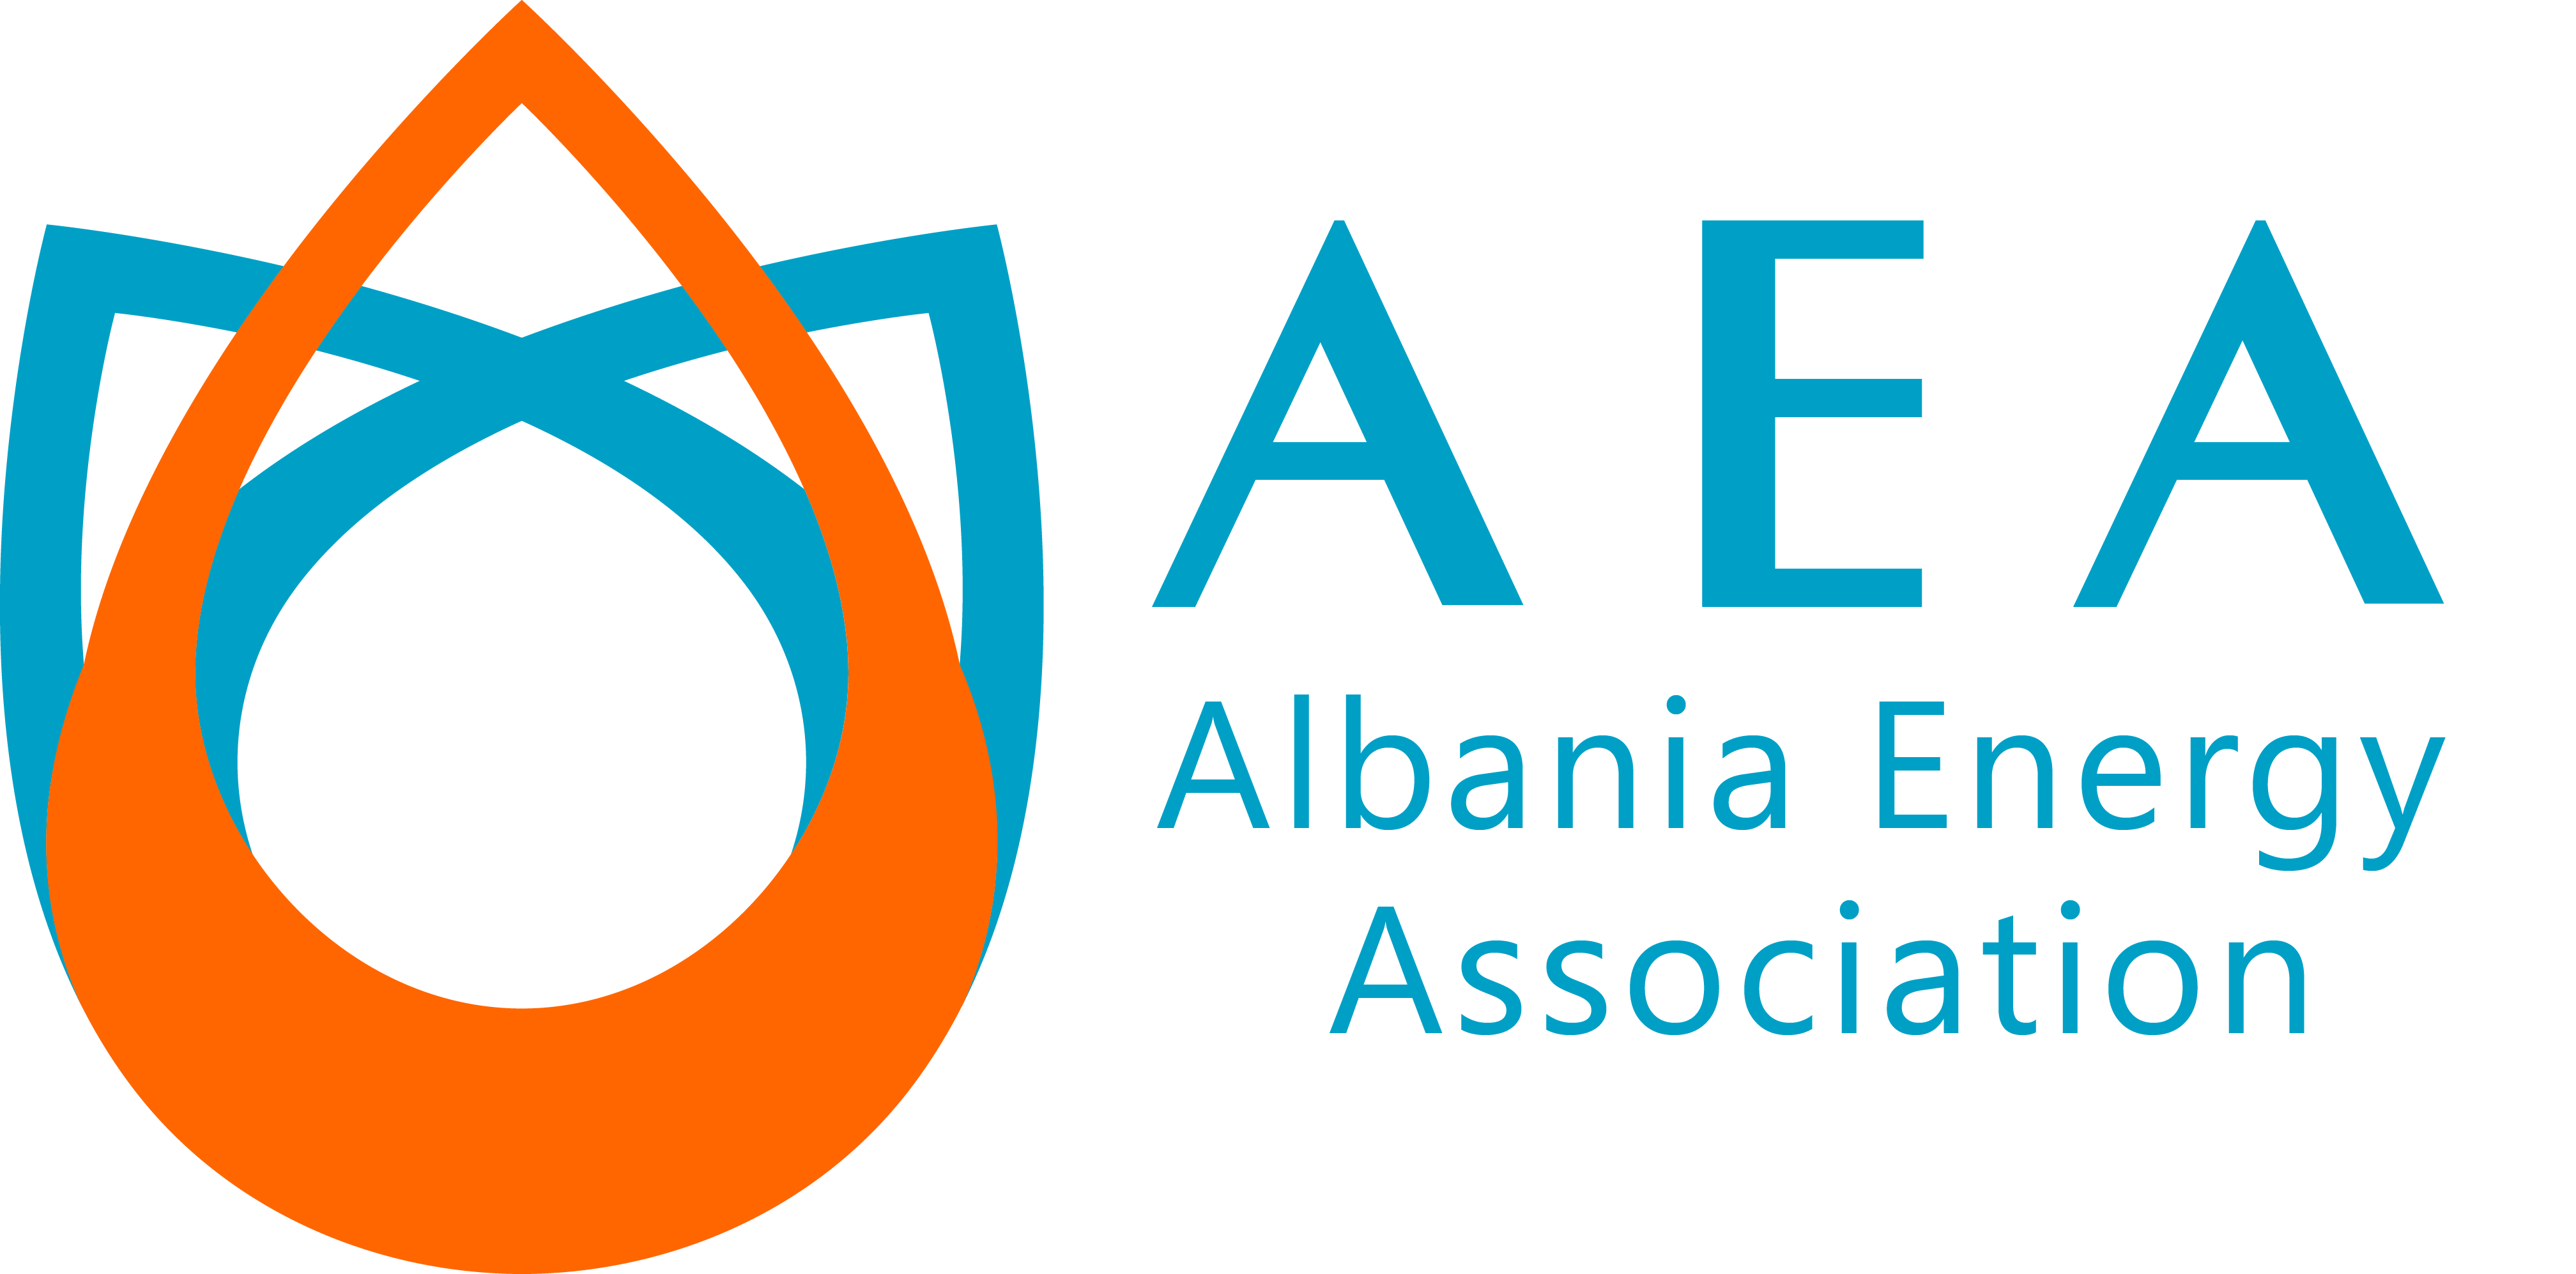 AEA - Albania Energy Association